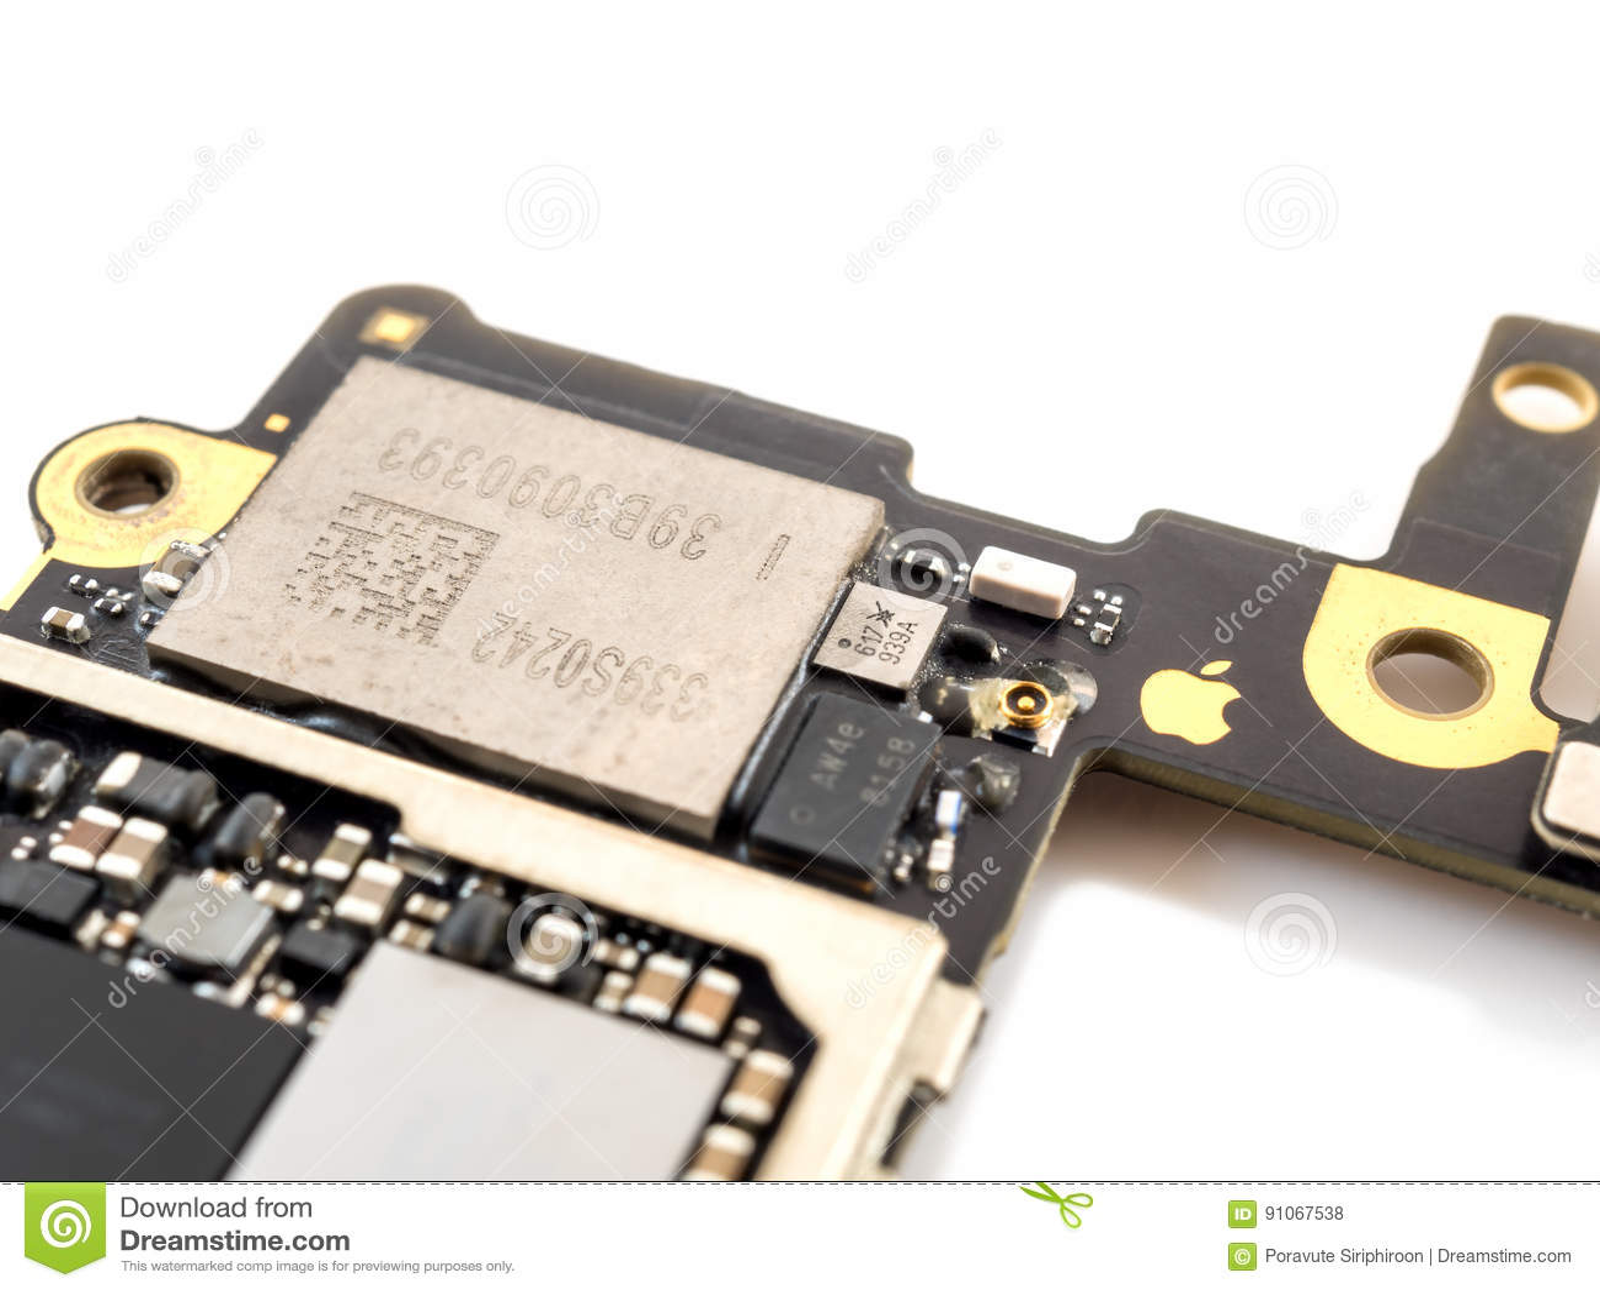 Apple iPhone 6 Wi-Fi IC chip